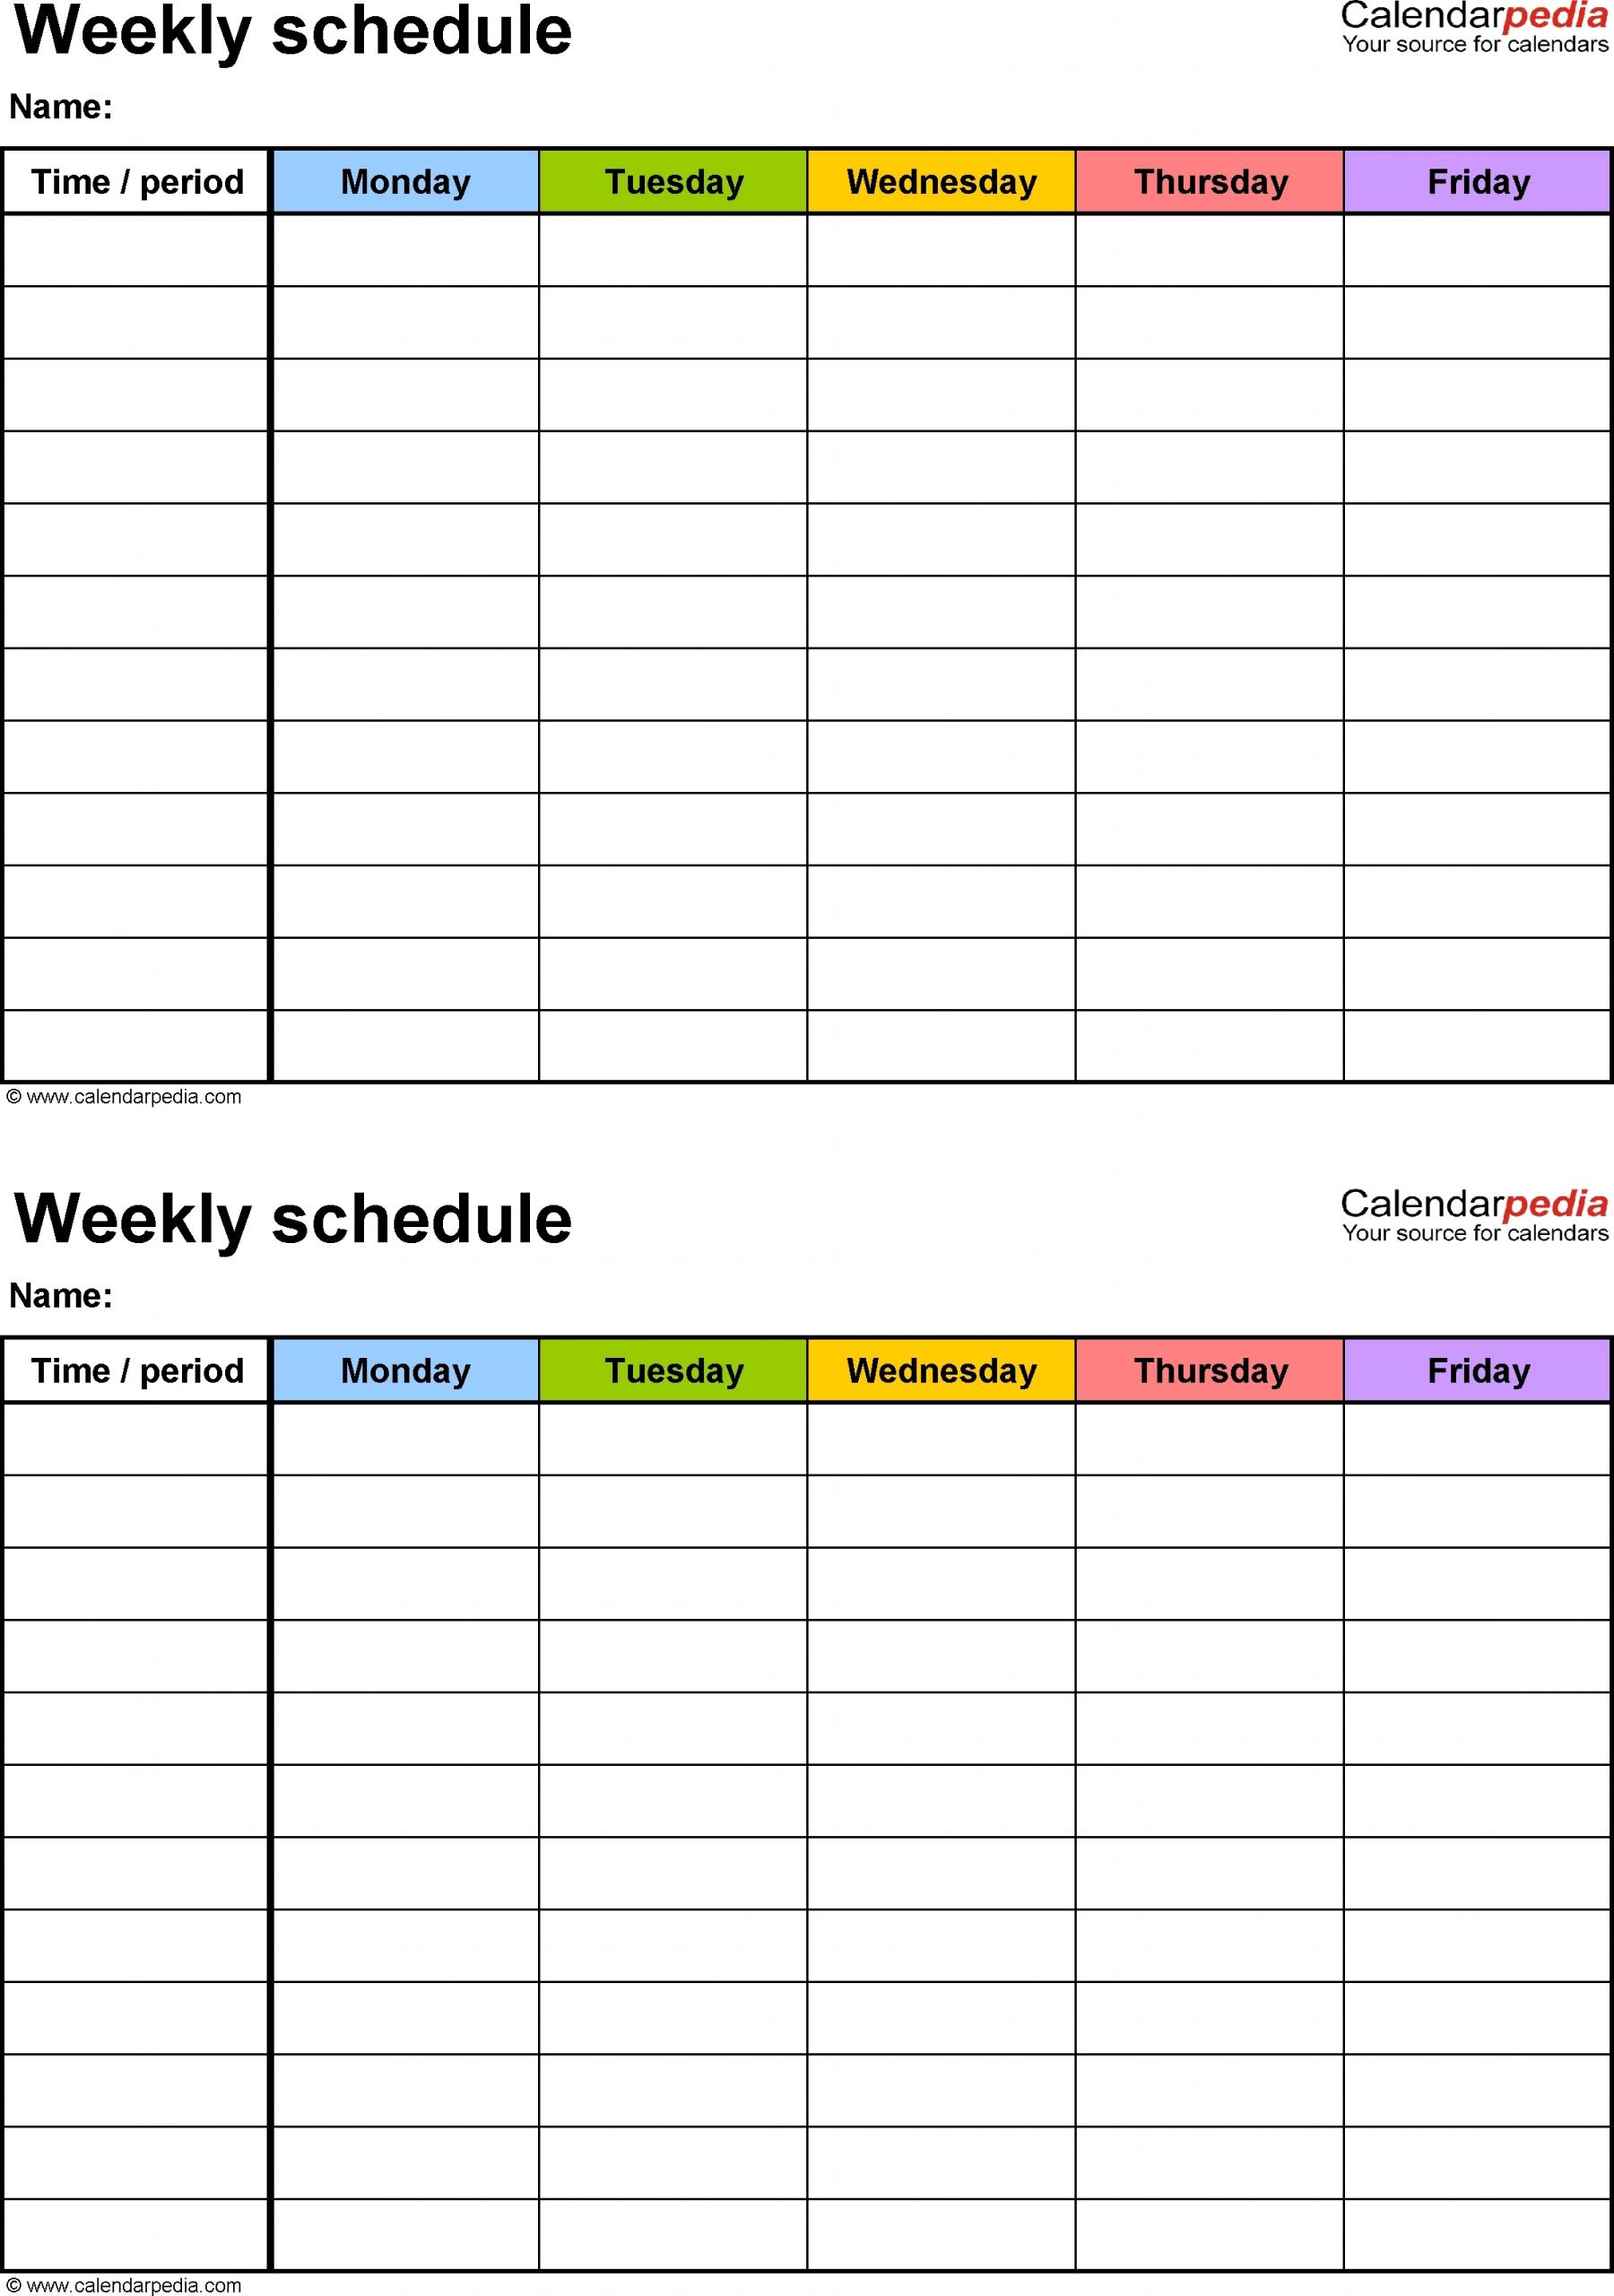 Blank Time Slot Week Schedules | Calendar Template Printable